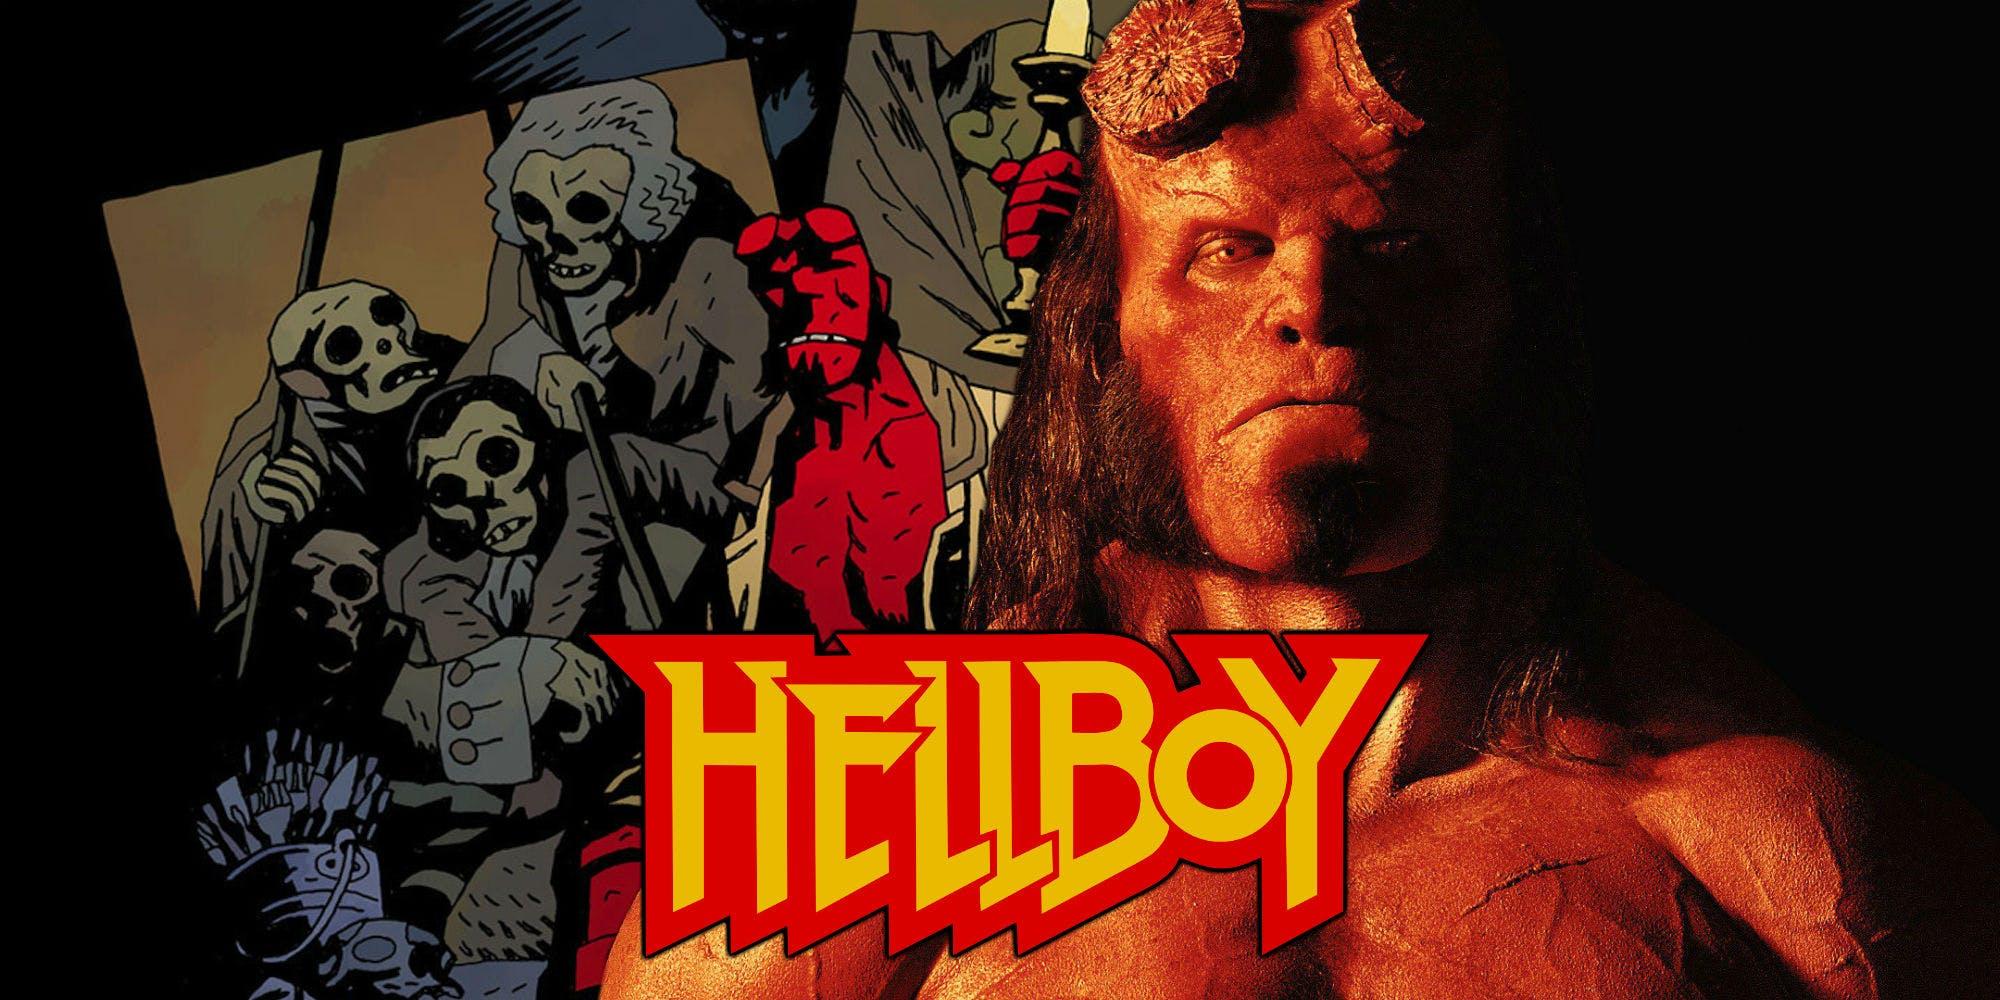 filme noi 2019 Hellboy